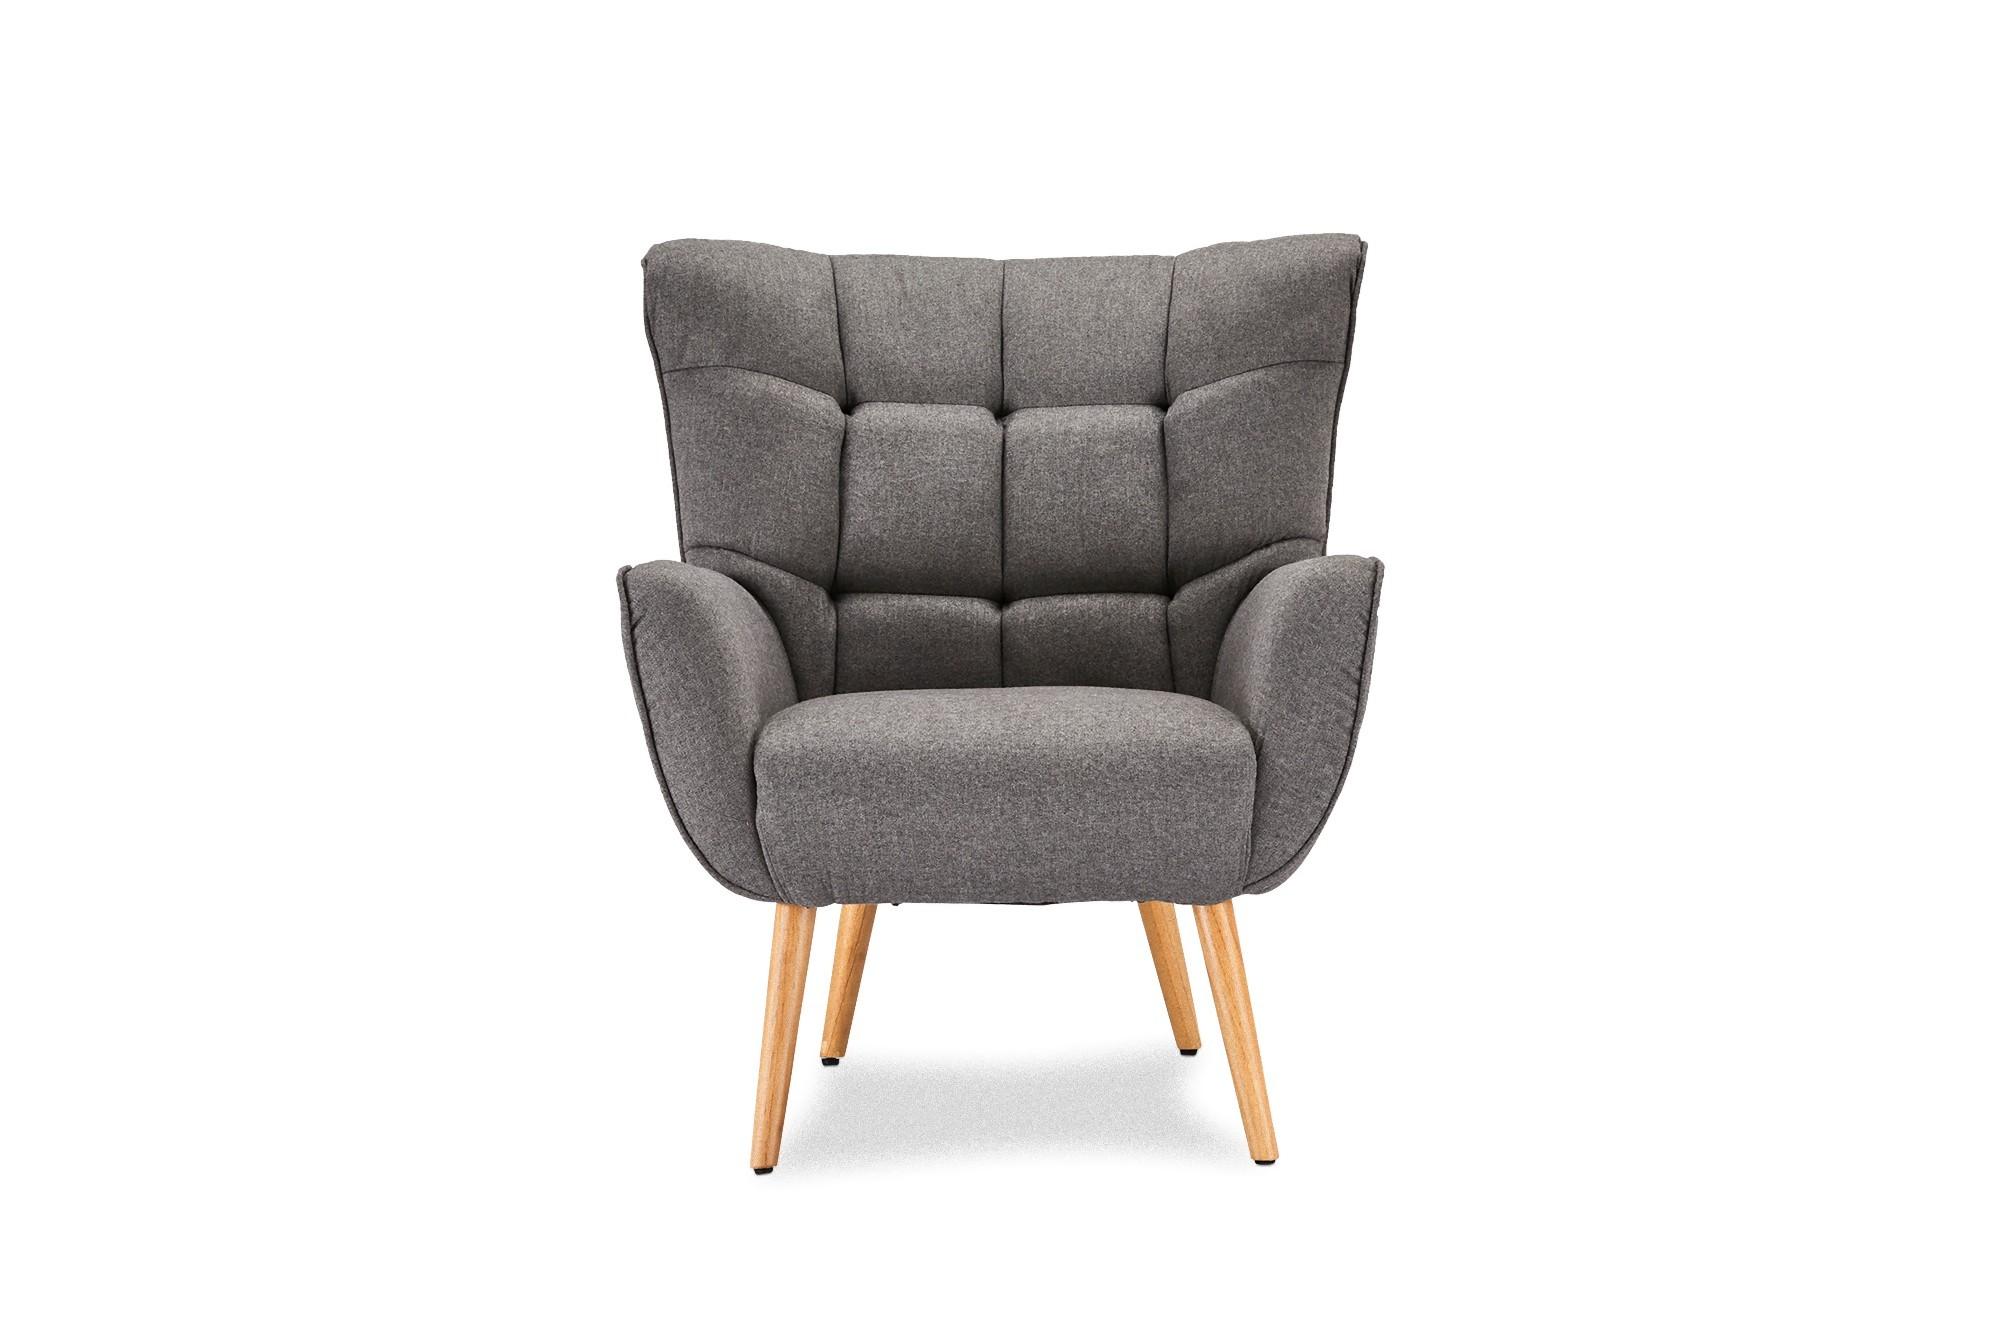 Pukka Sessel Grun Esszimmer Stuhl Wohnzimmer Clubsessel Cocktailsessel Lounge Ebay